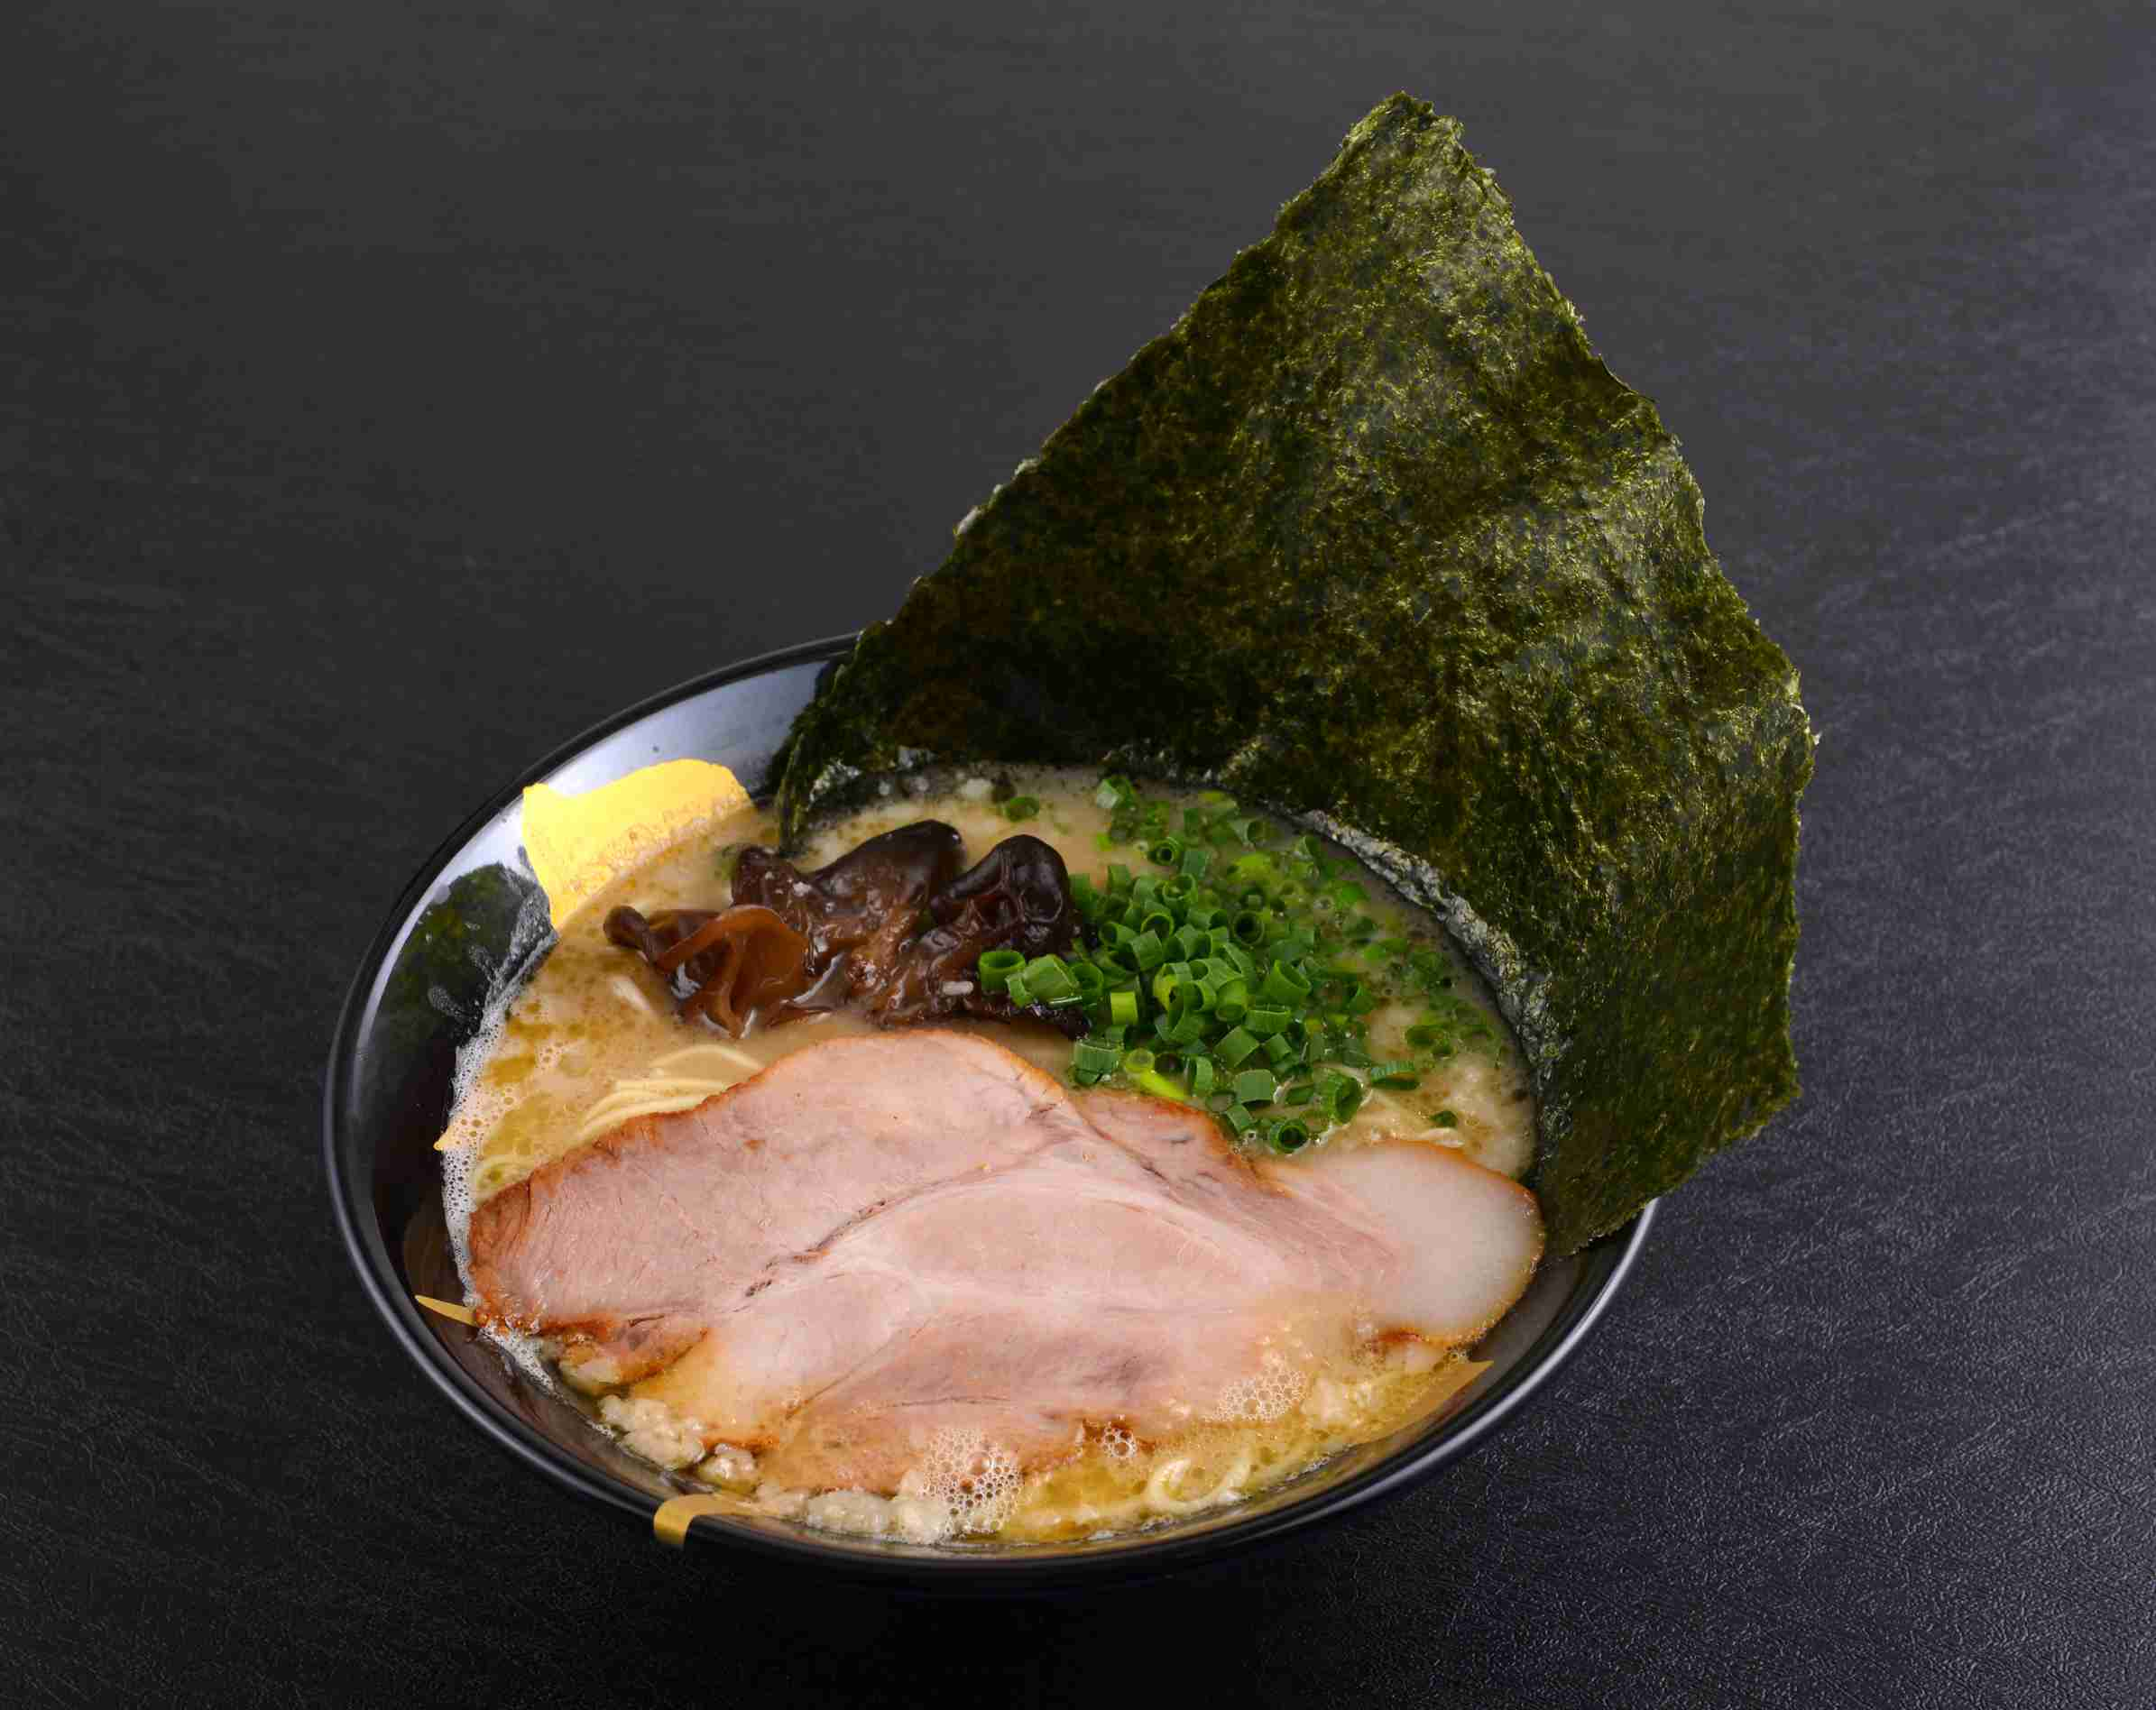 Tonkotsu Ramen with Japanese Seaweed ($12.90)